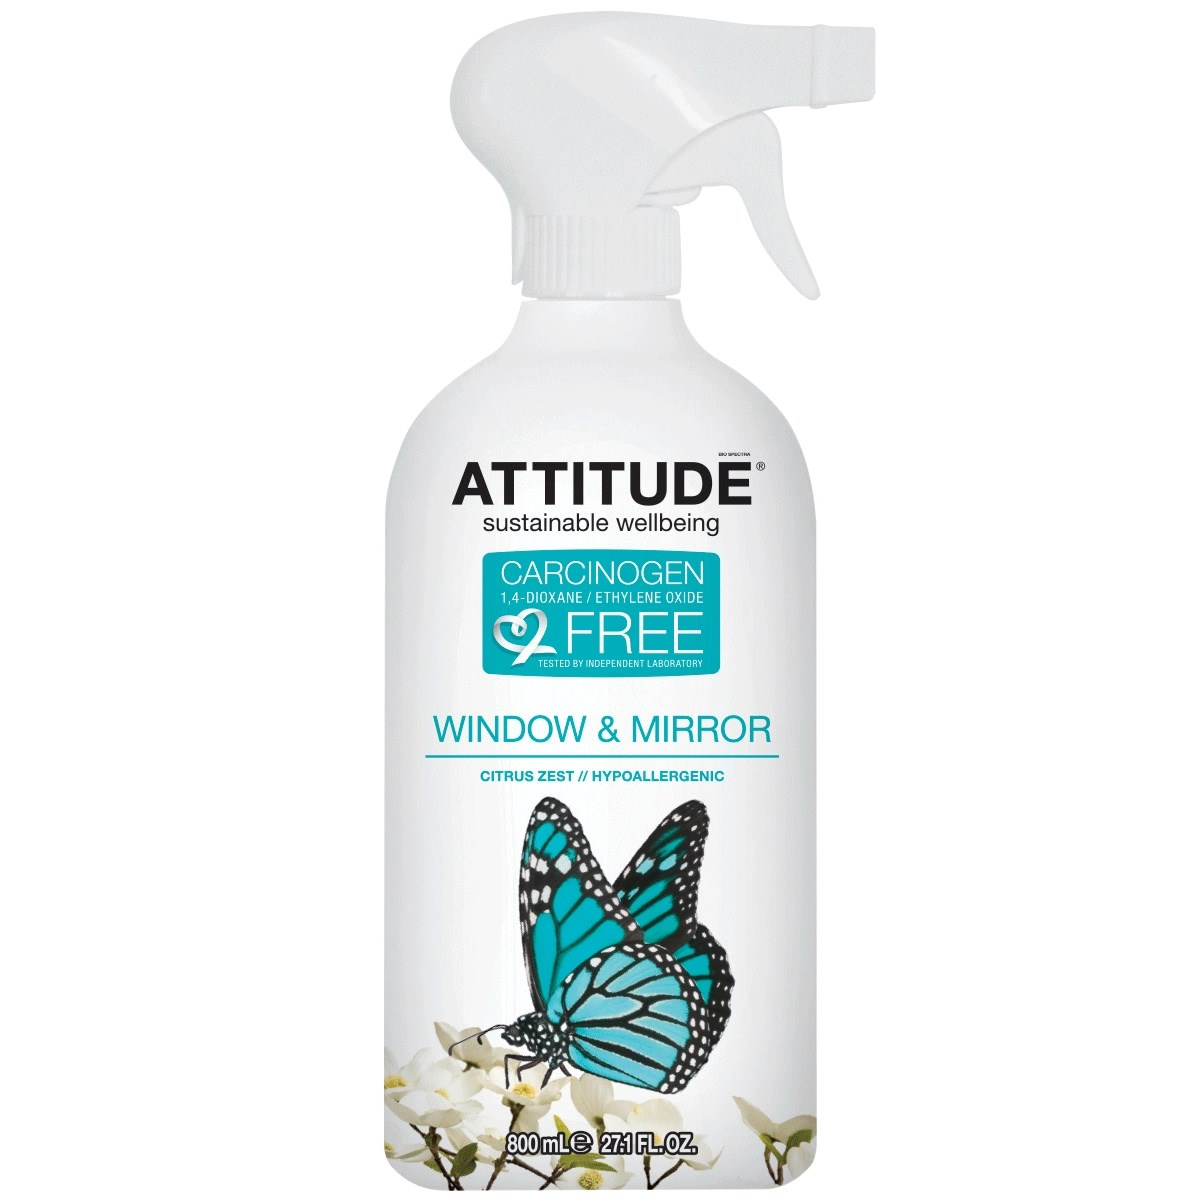 Attitude Window & Mirror Citrus Zest Cleaner